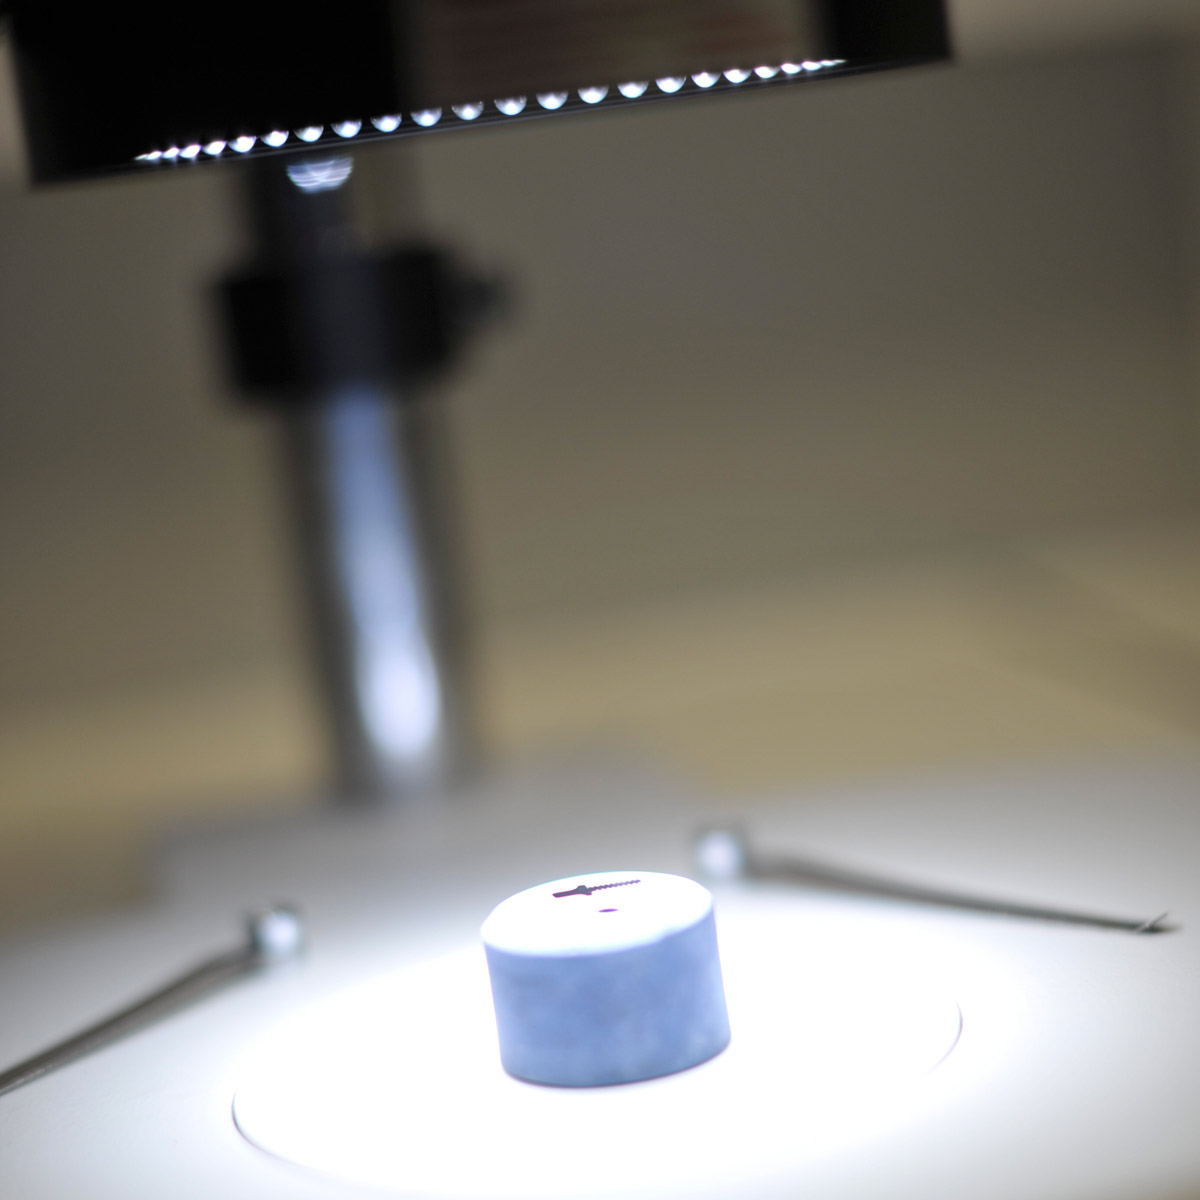 Stereo-microscope-3